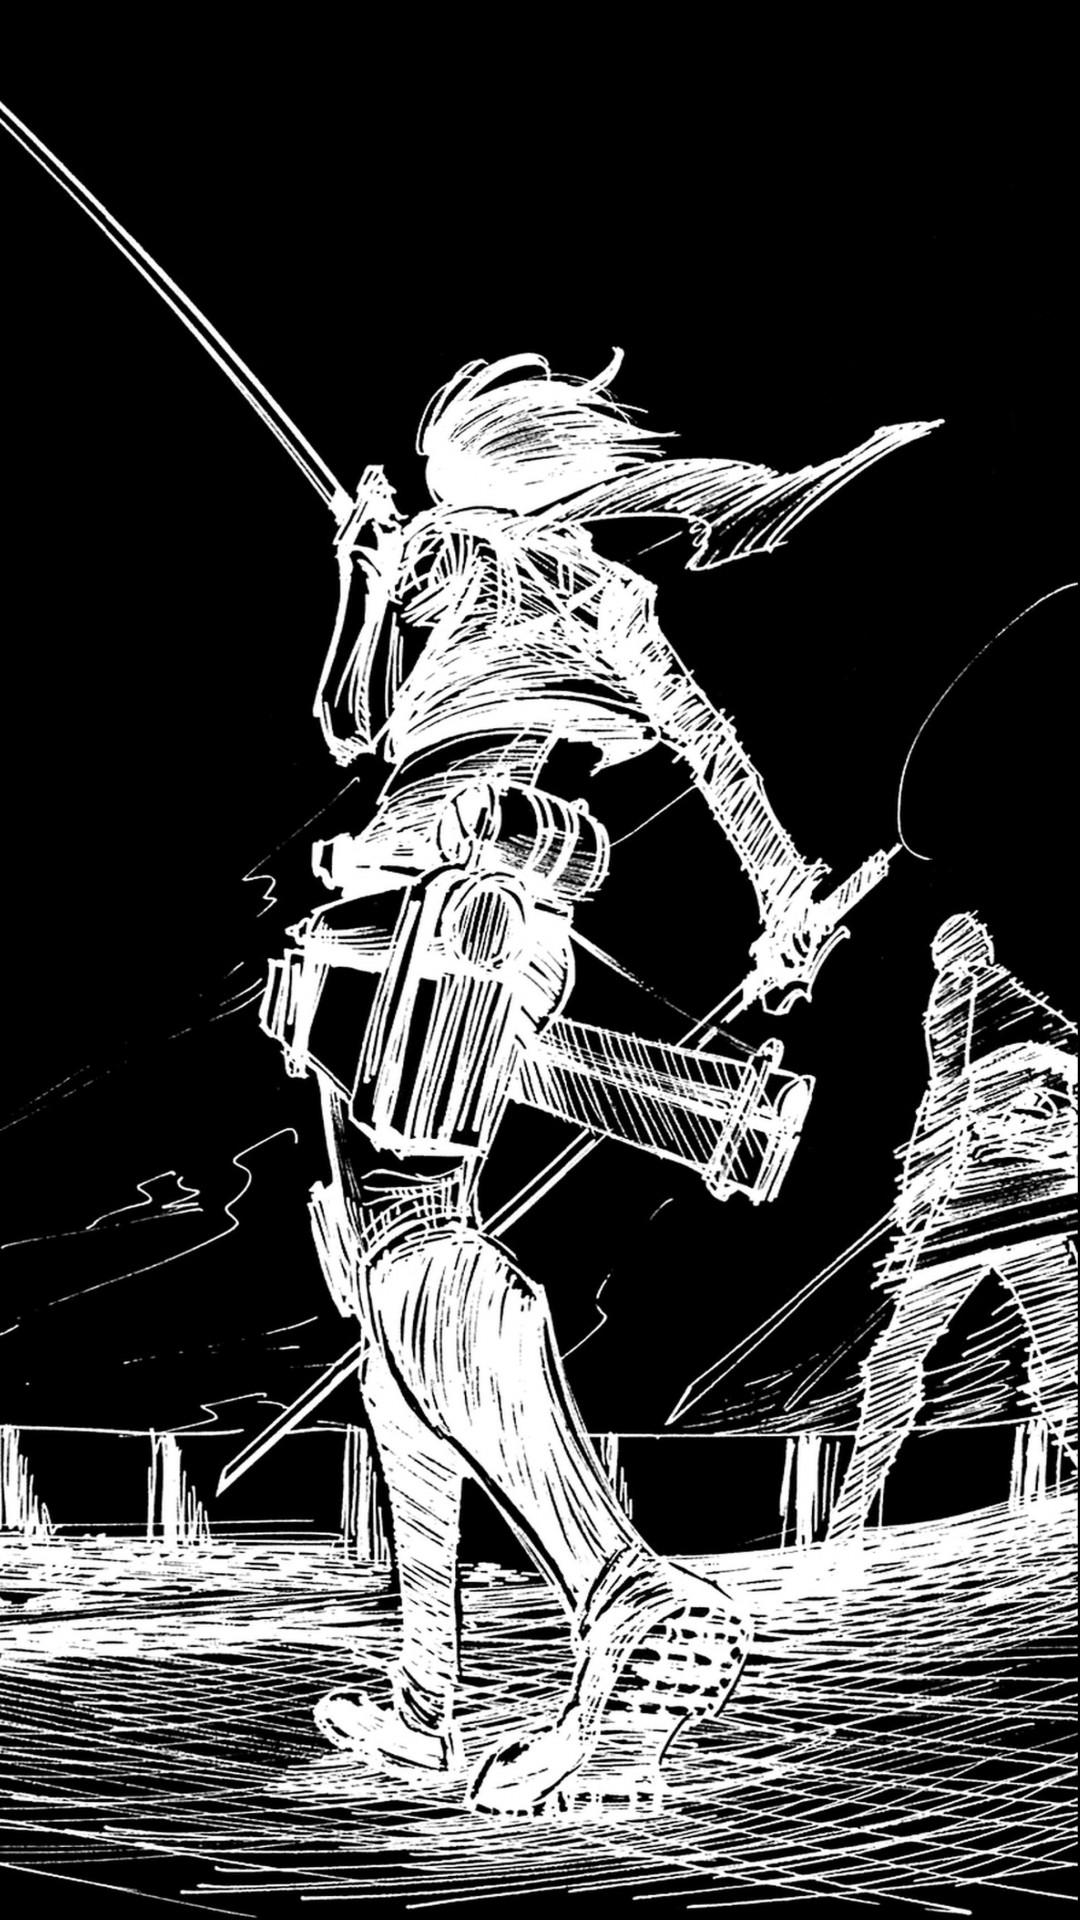 Iphone Wallpaper Cartoon Black